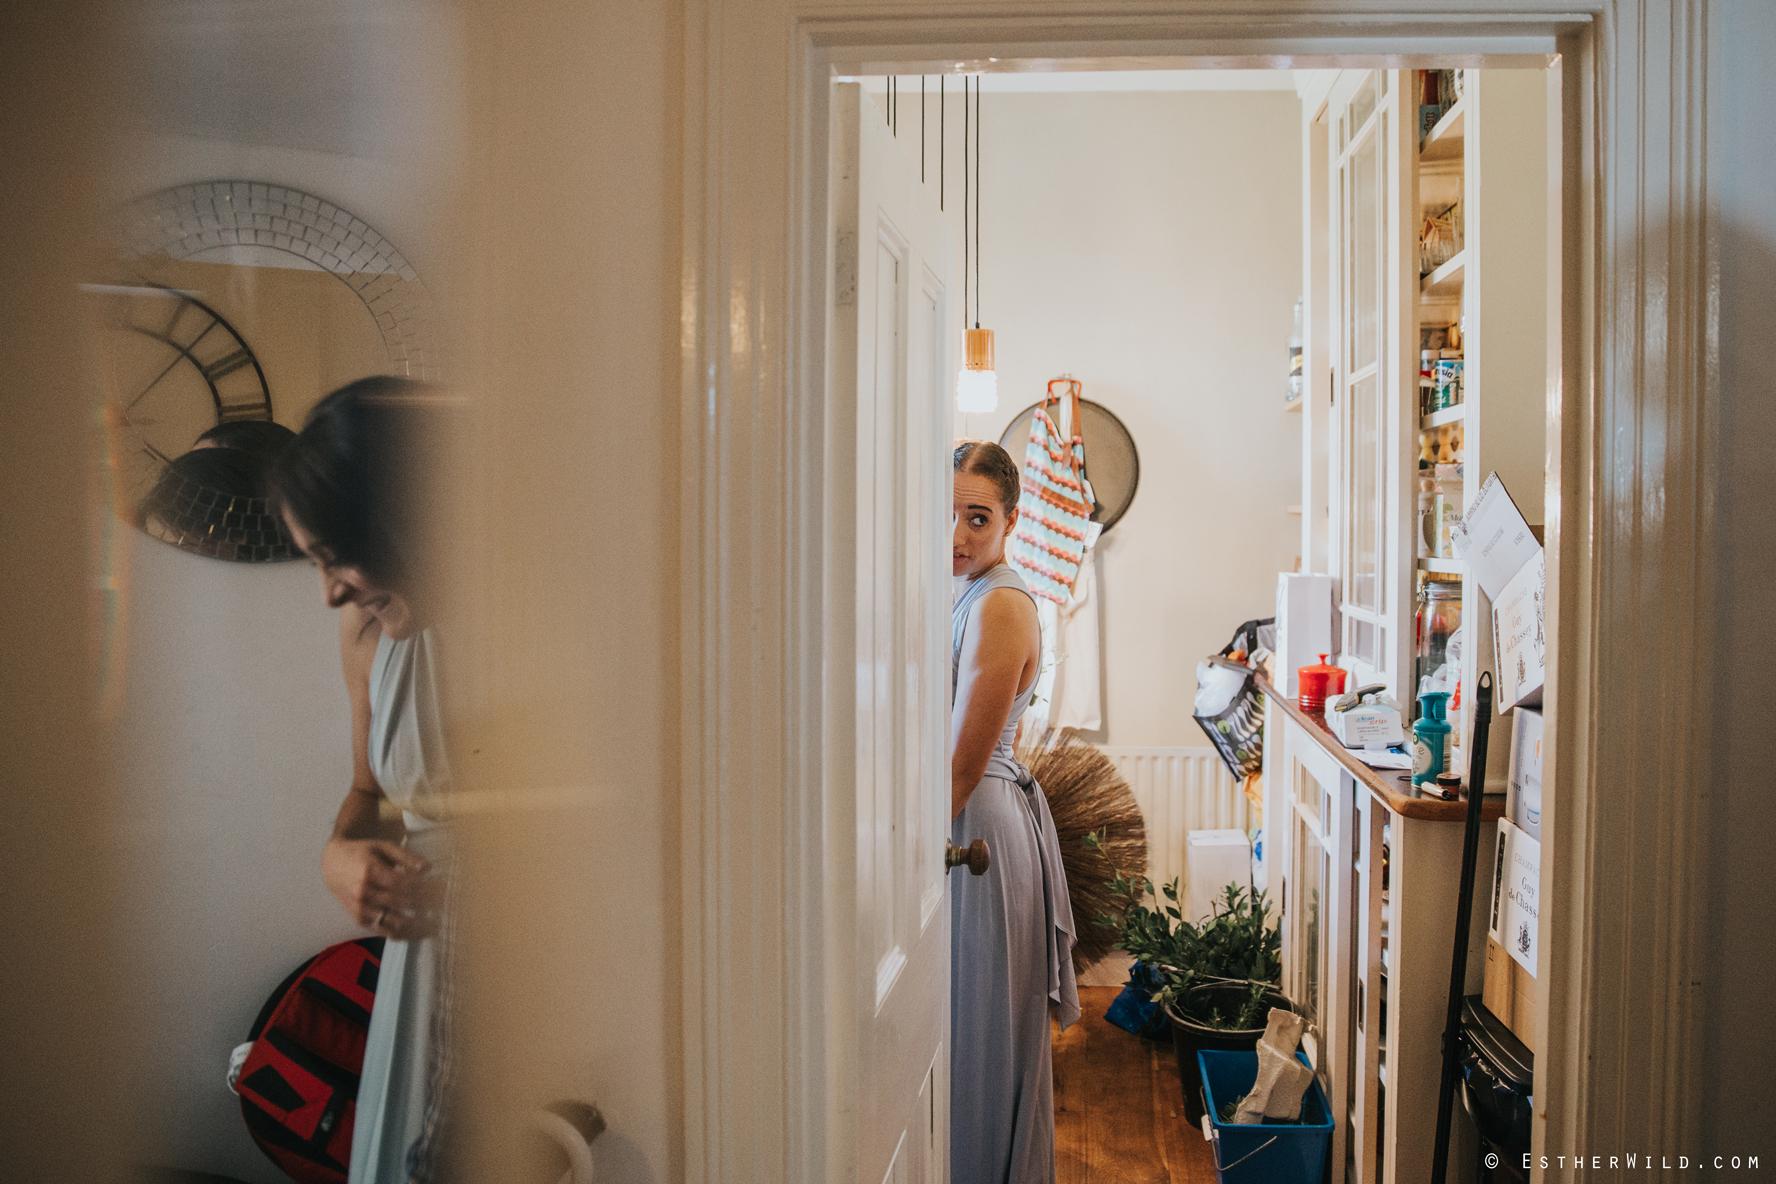 Islington_Town_Hall_Wedding_London_Photographer_Esther_Wild_IMG_4020.jpg